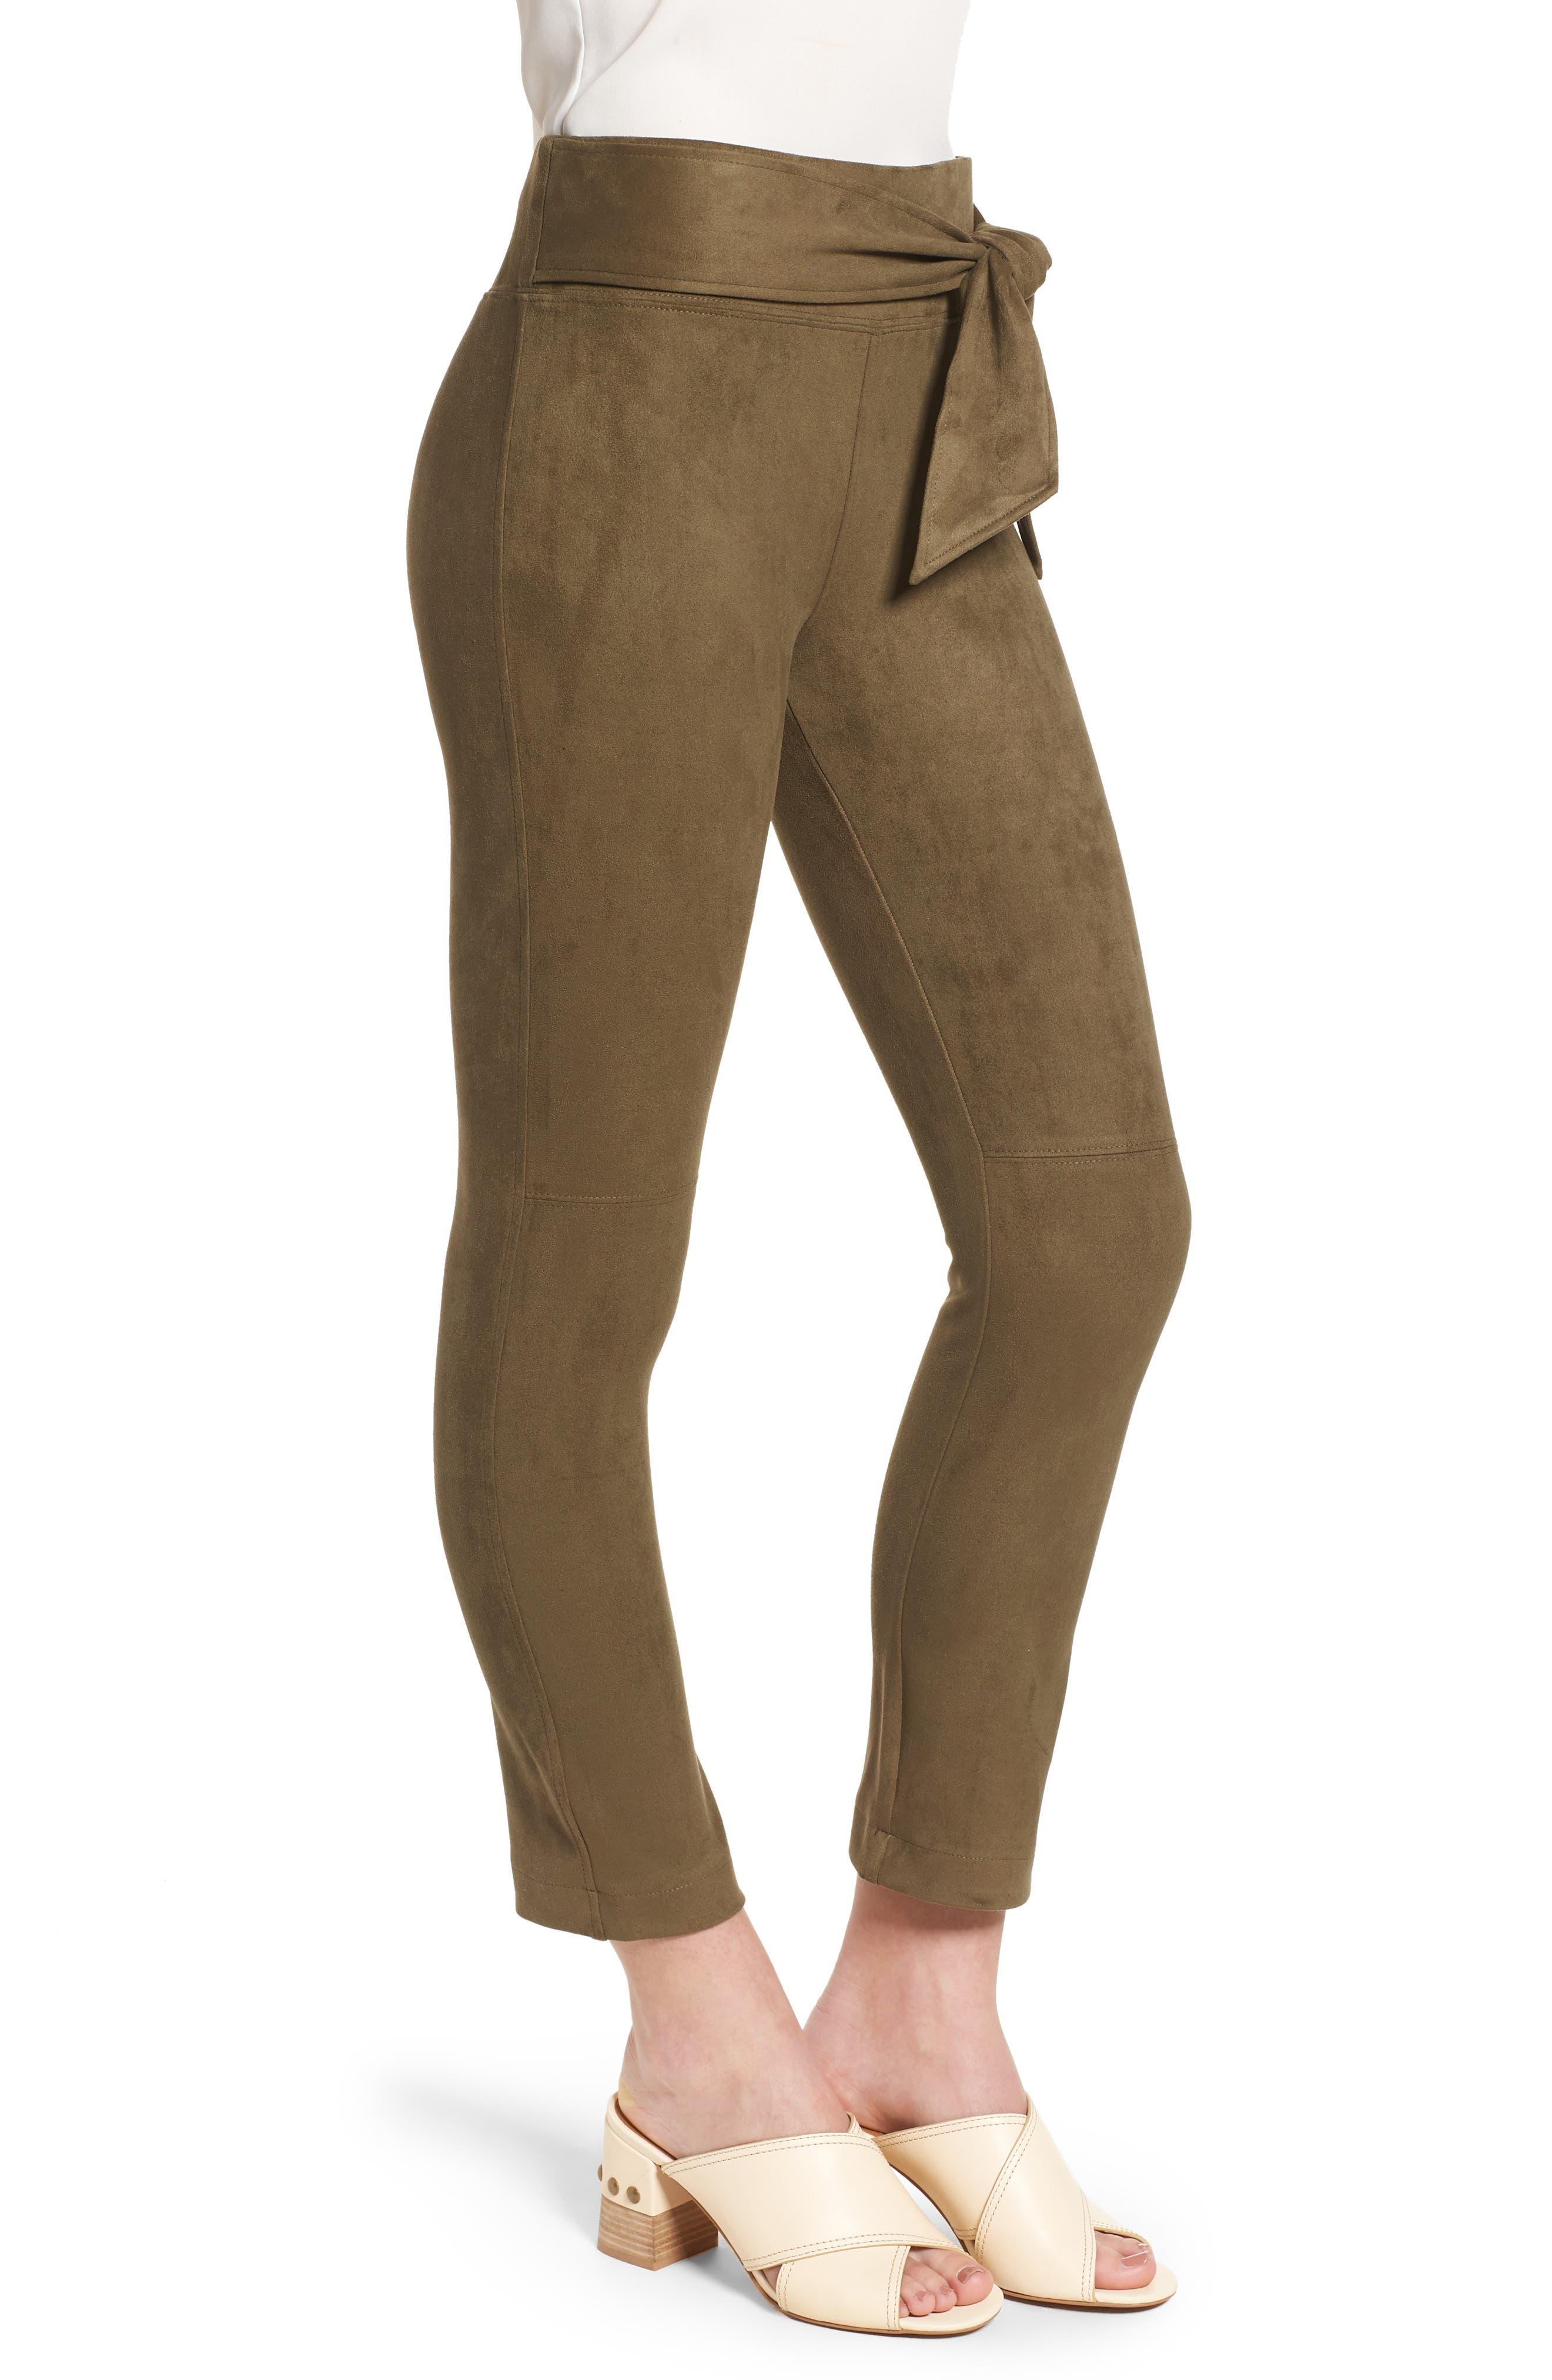 DAVID LERNER,                             Waist Tie Skimmer Leggings,                             Alternate thumbnail 3, color,                             ARMY GREEN